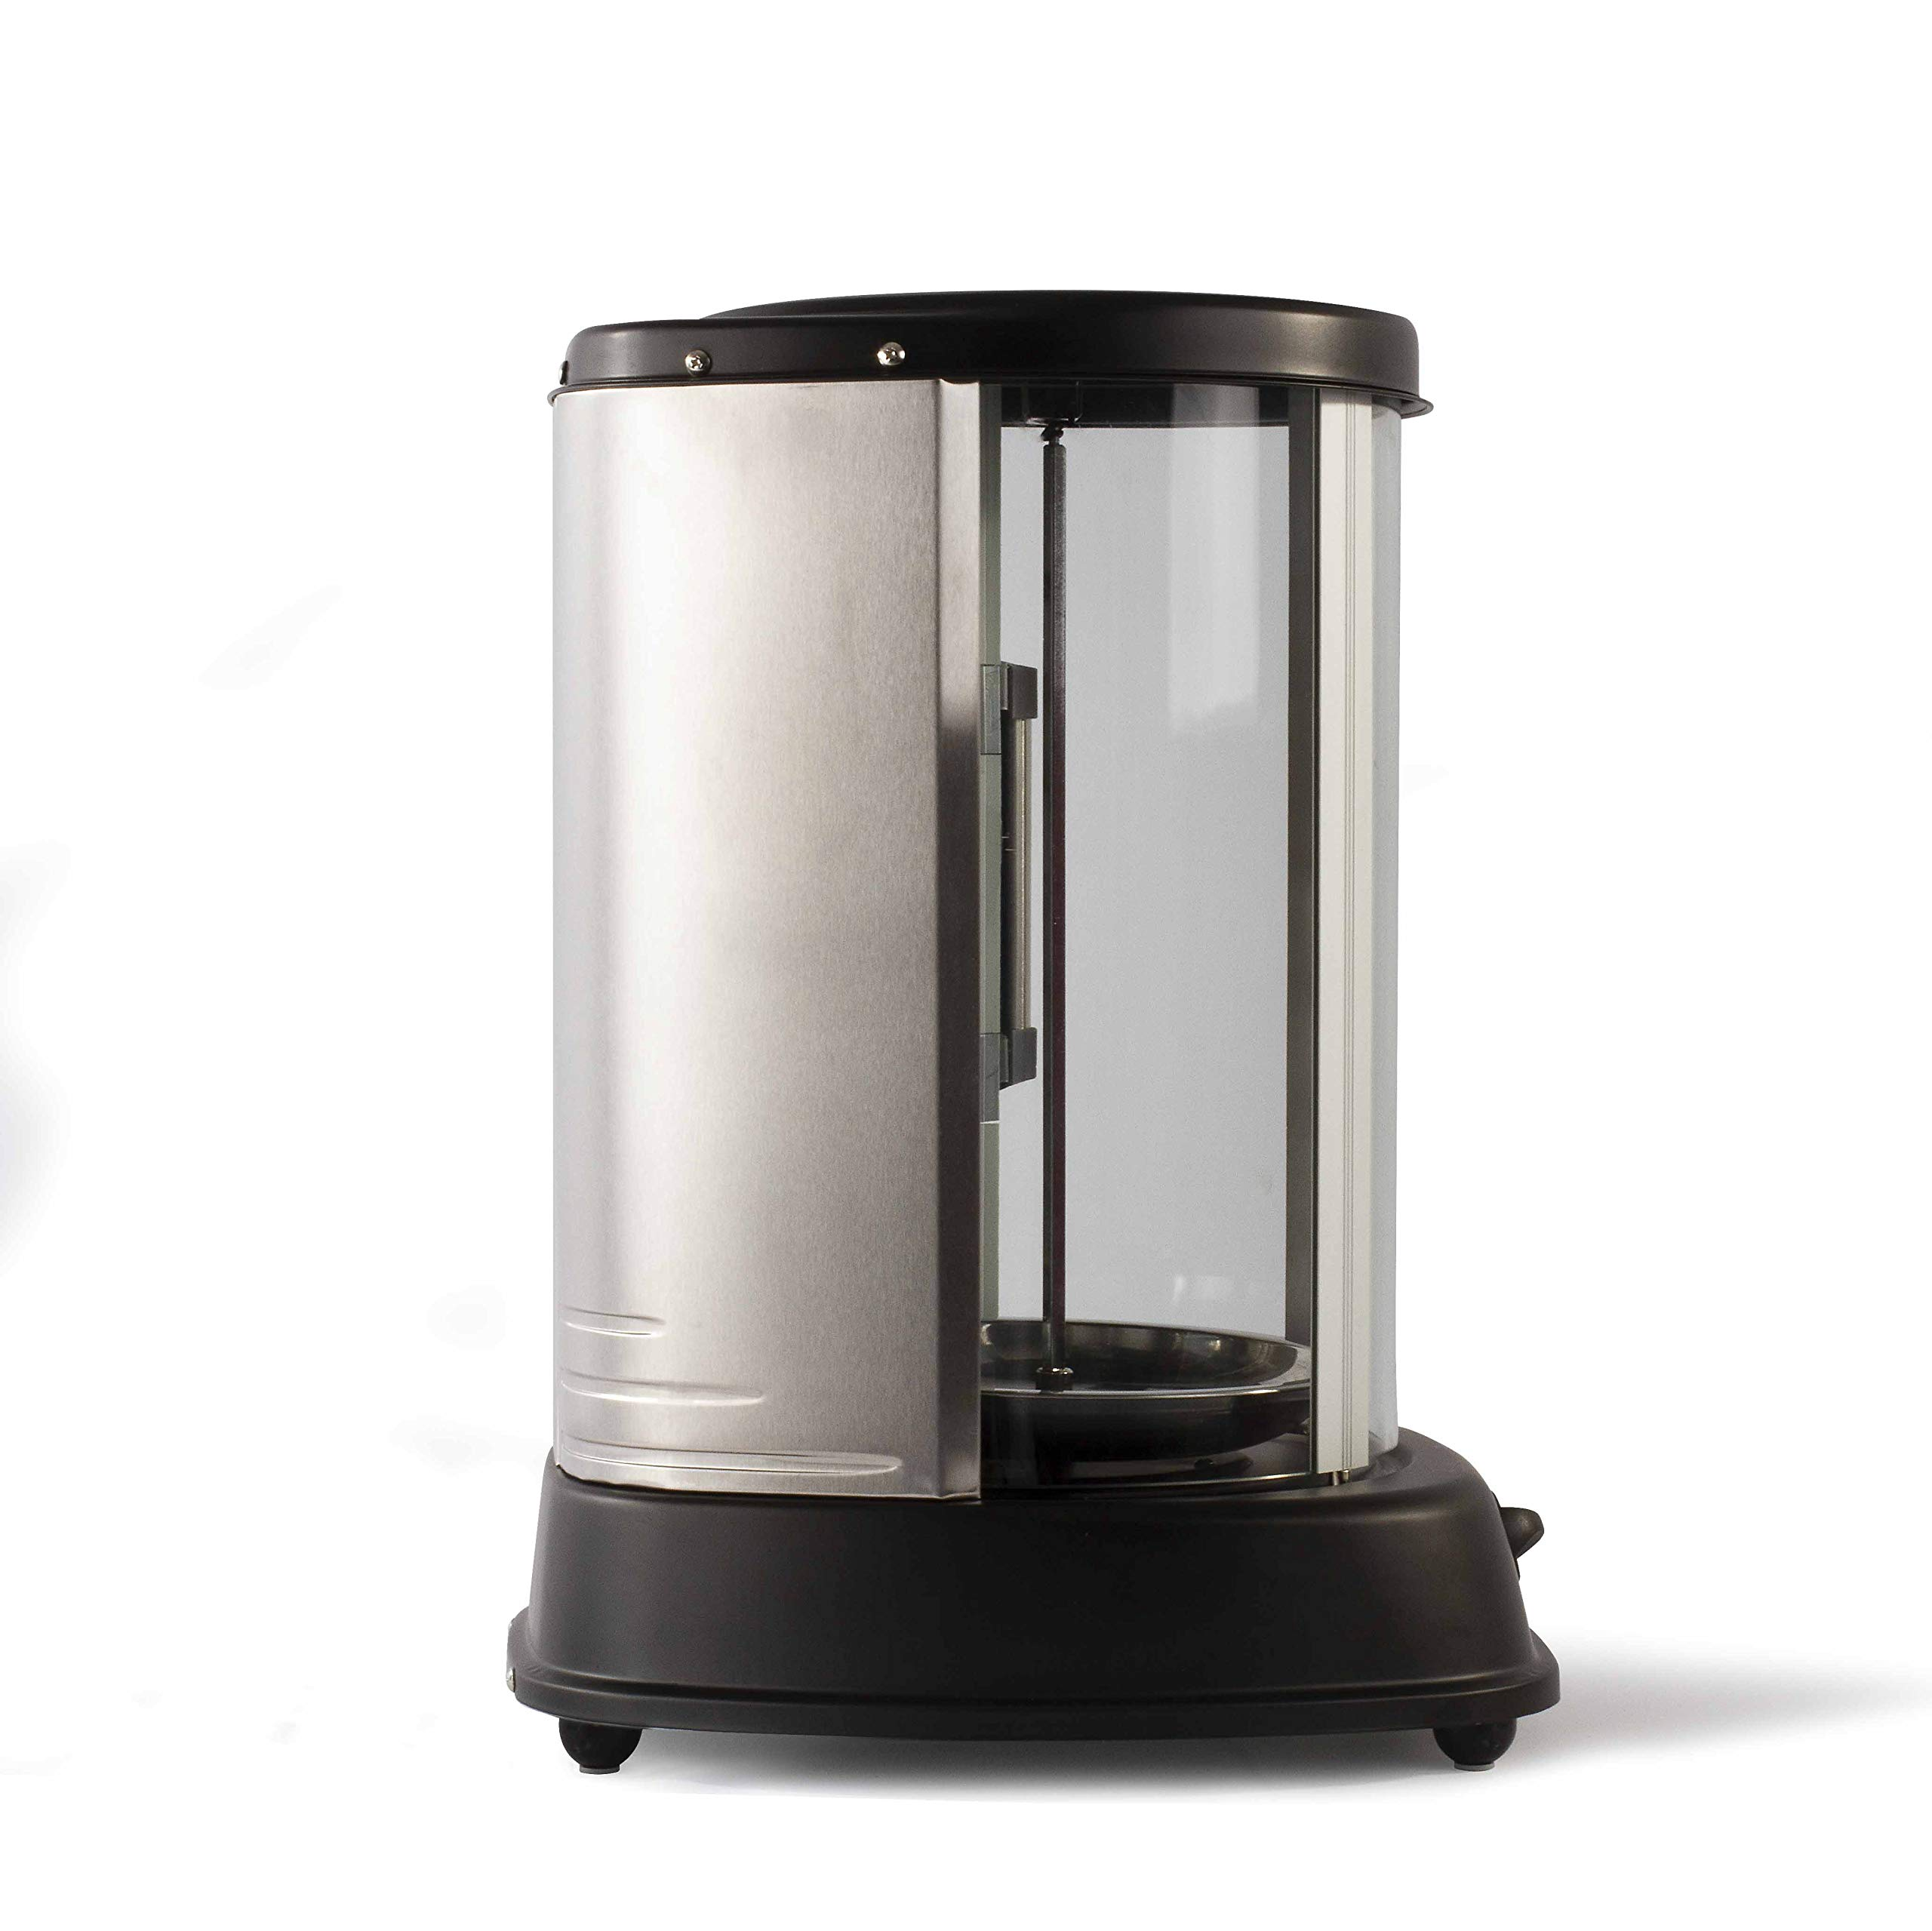 Domoclip 323DOM - Parrilla eléctrica rotativa, 1500 W, color negro: Amazon.es: Hogar